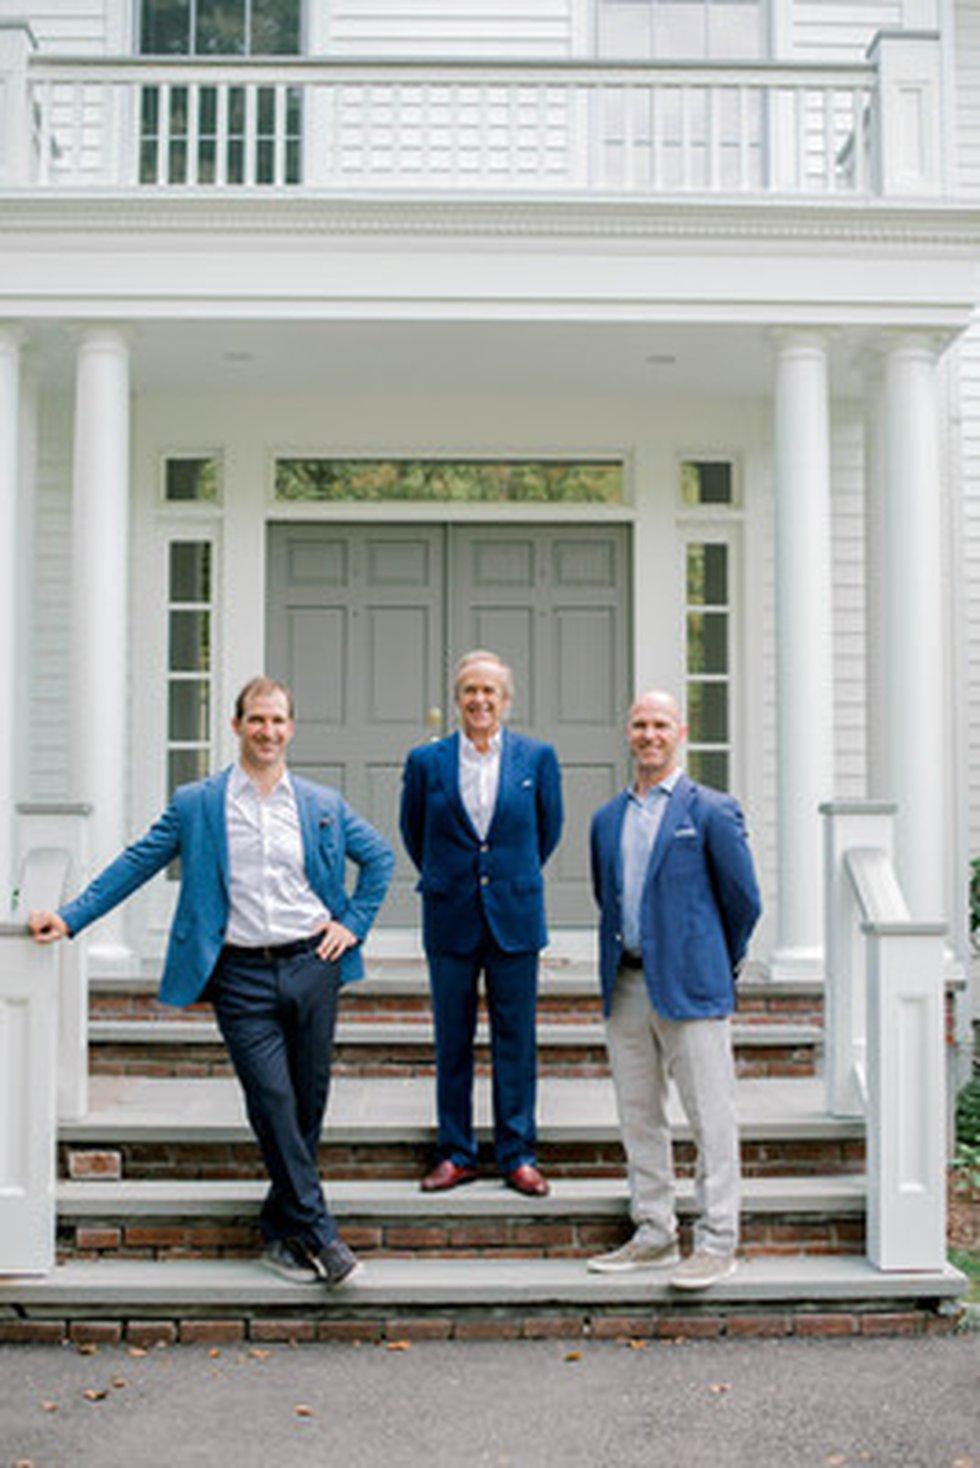 Left to right: Ryan Raveis (WRRE Co-President/WRM President), Bill Raveis (WRRE Founder and...